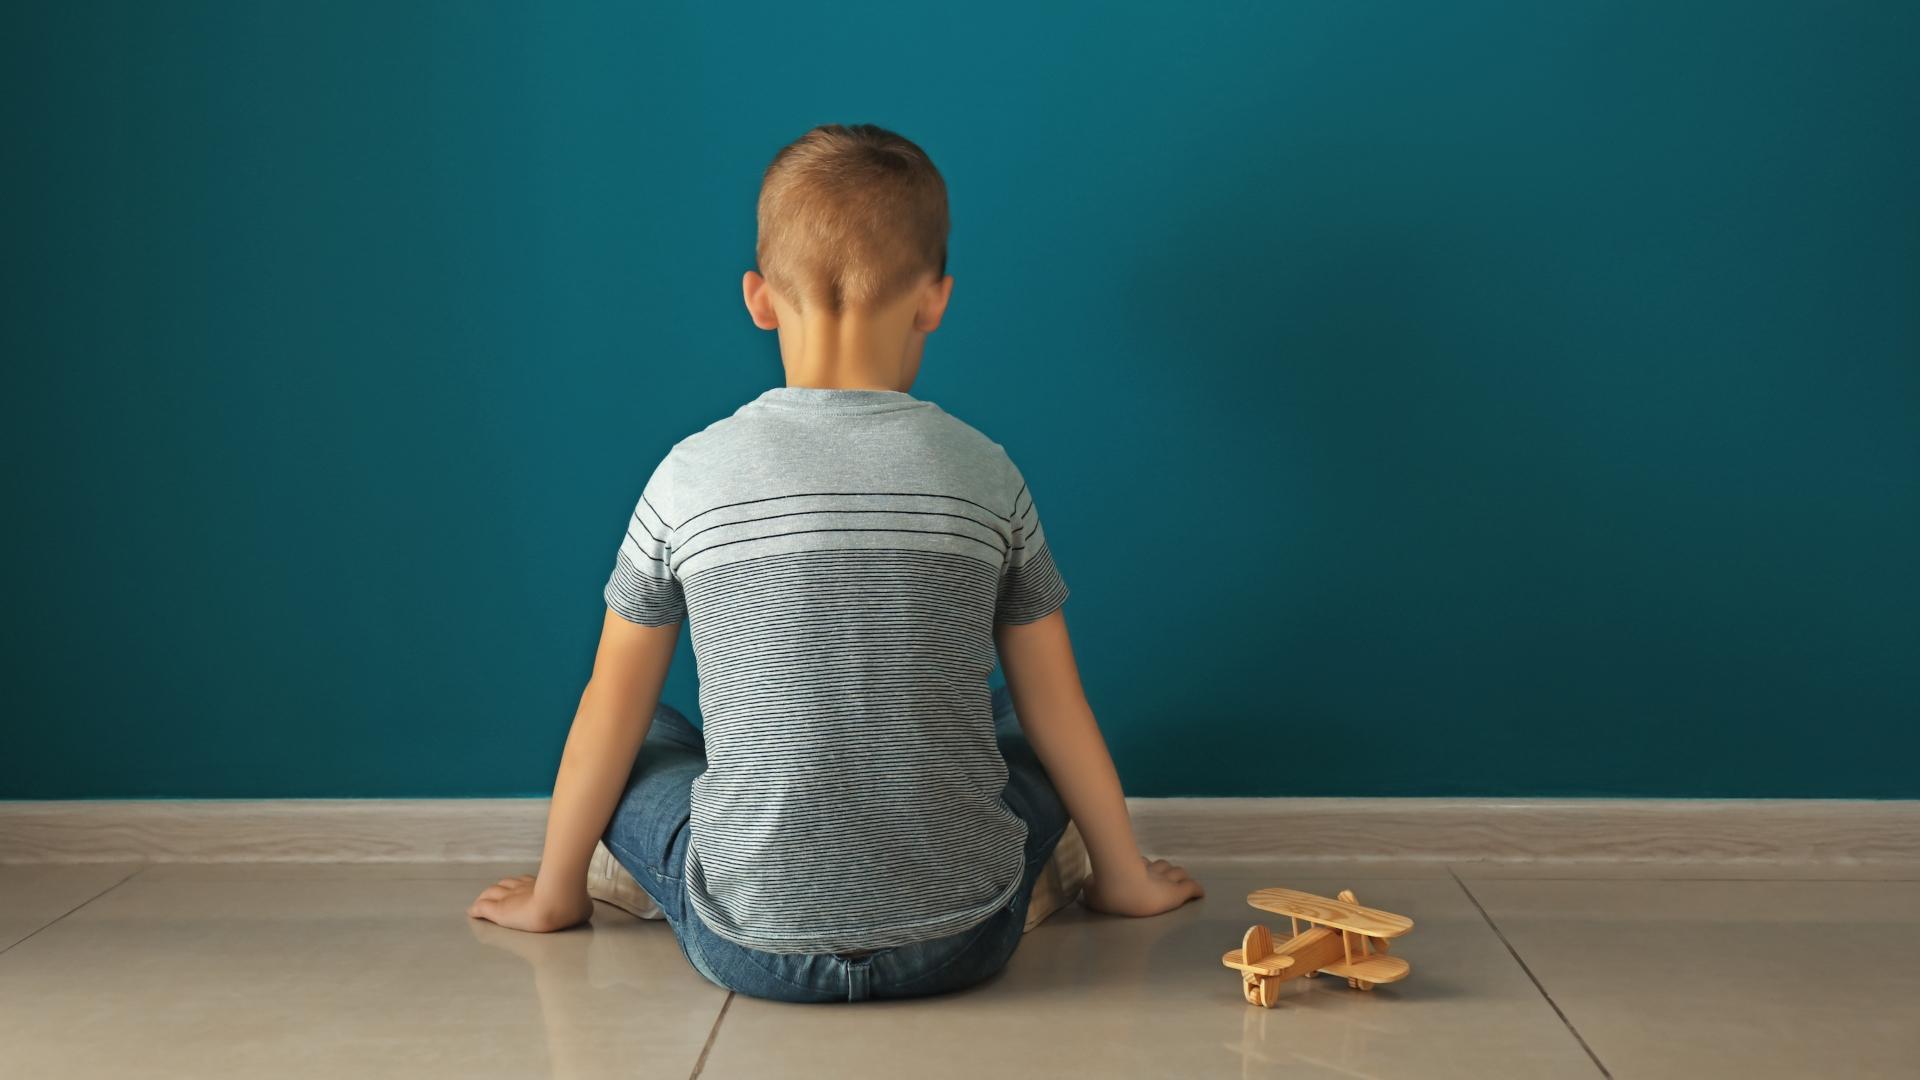 Воспаление против аутизма